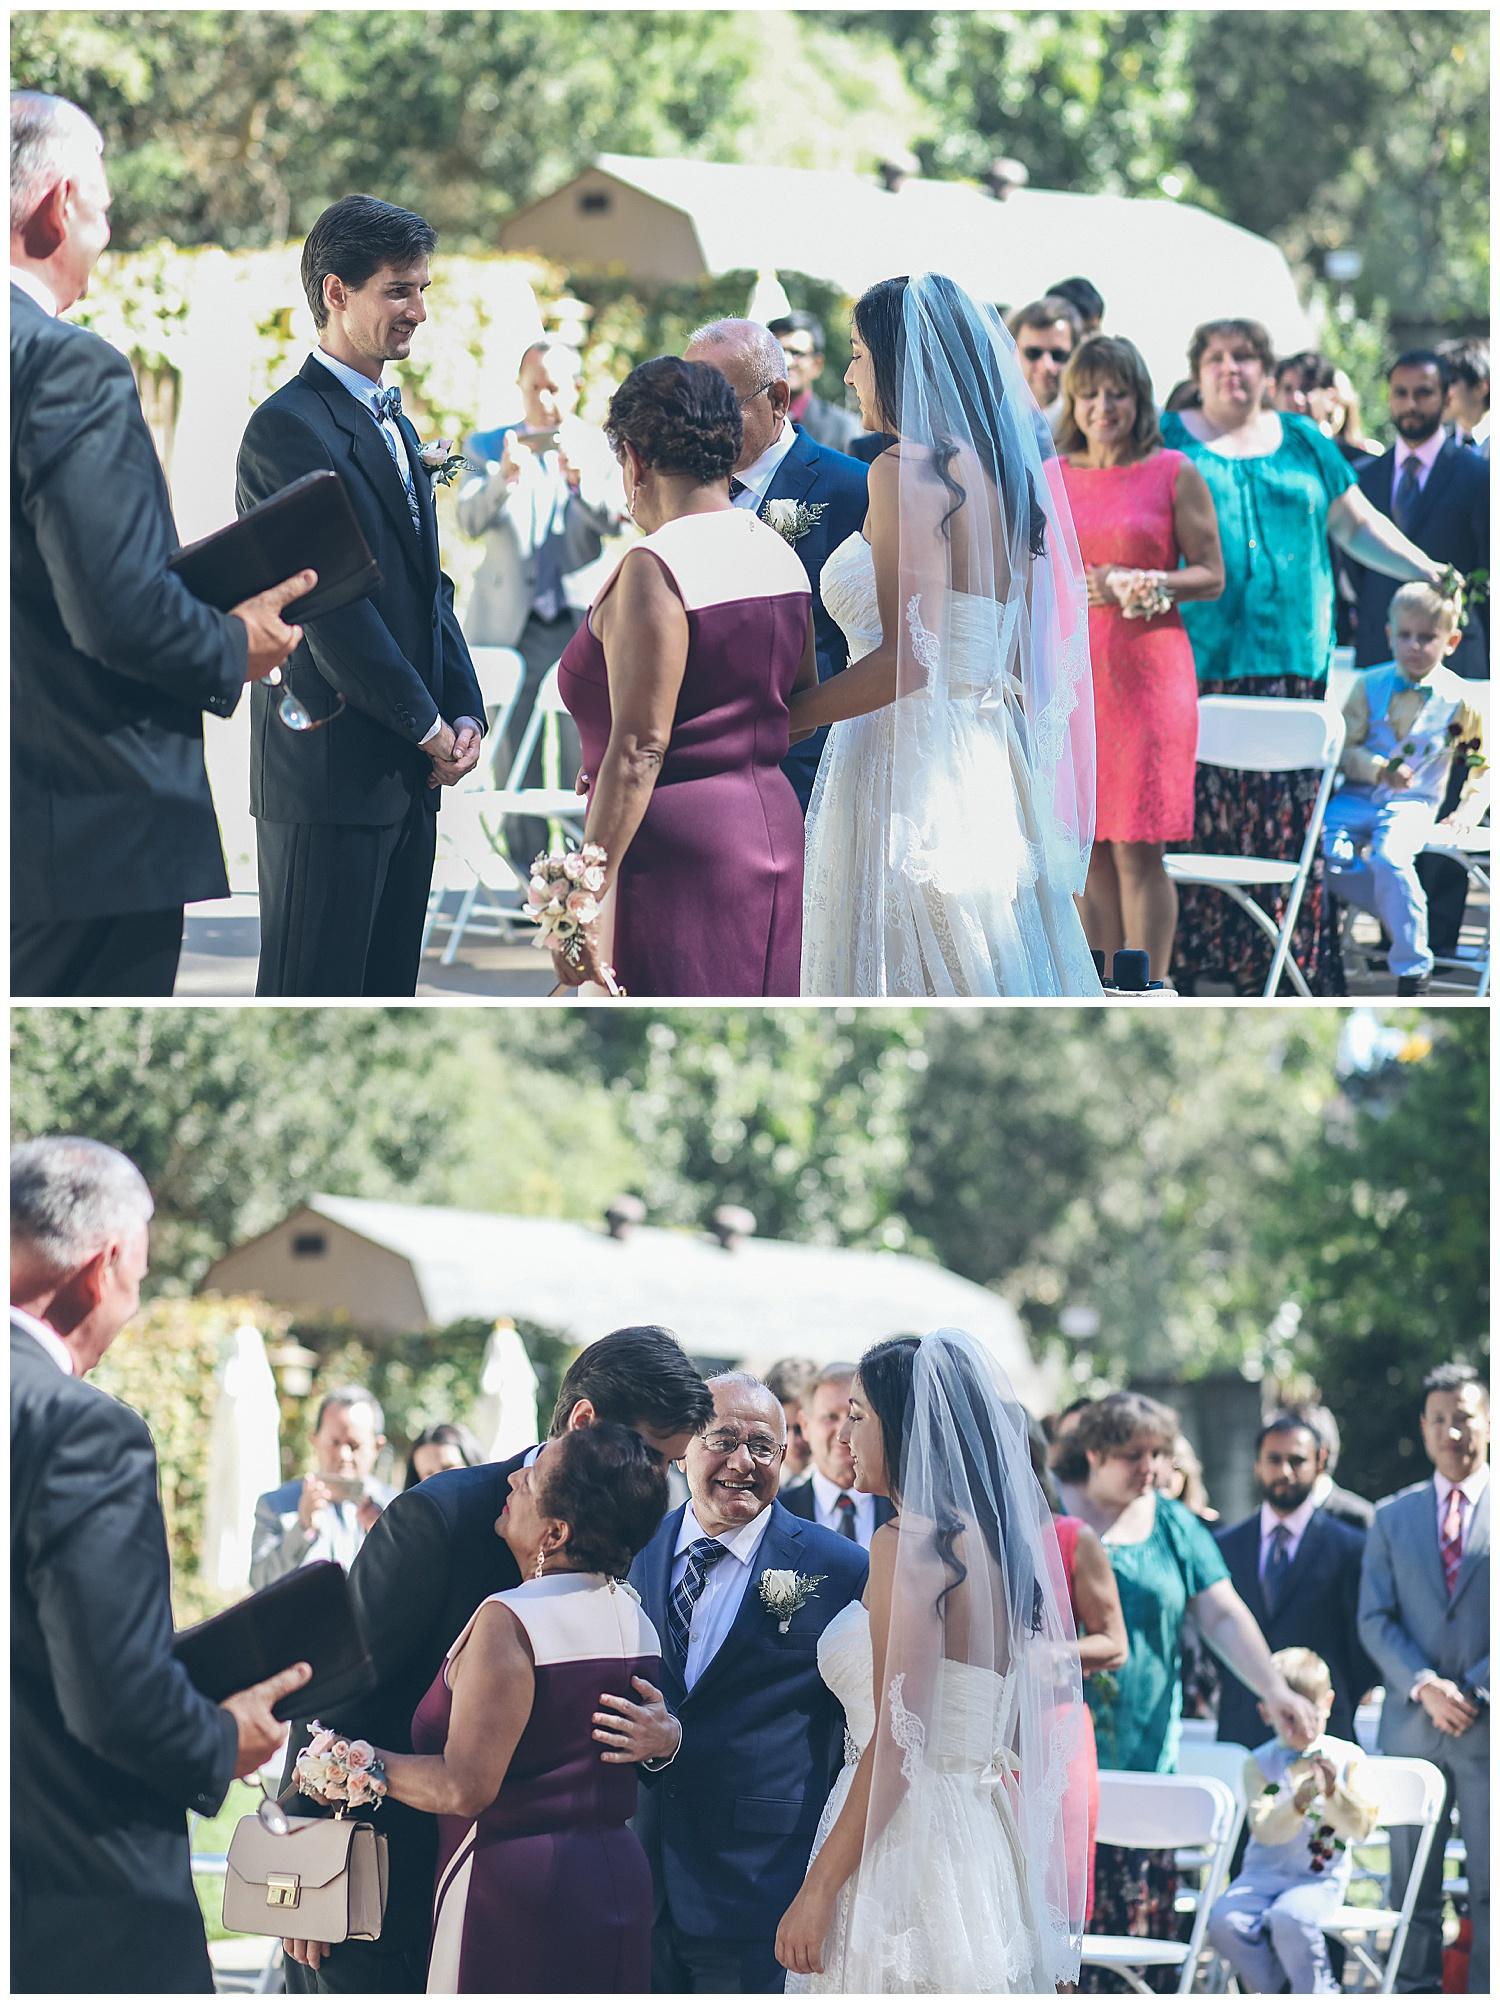 khariza-rae-photography-bay-area-wedding-photographer_0133.jpg